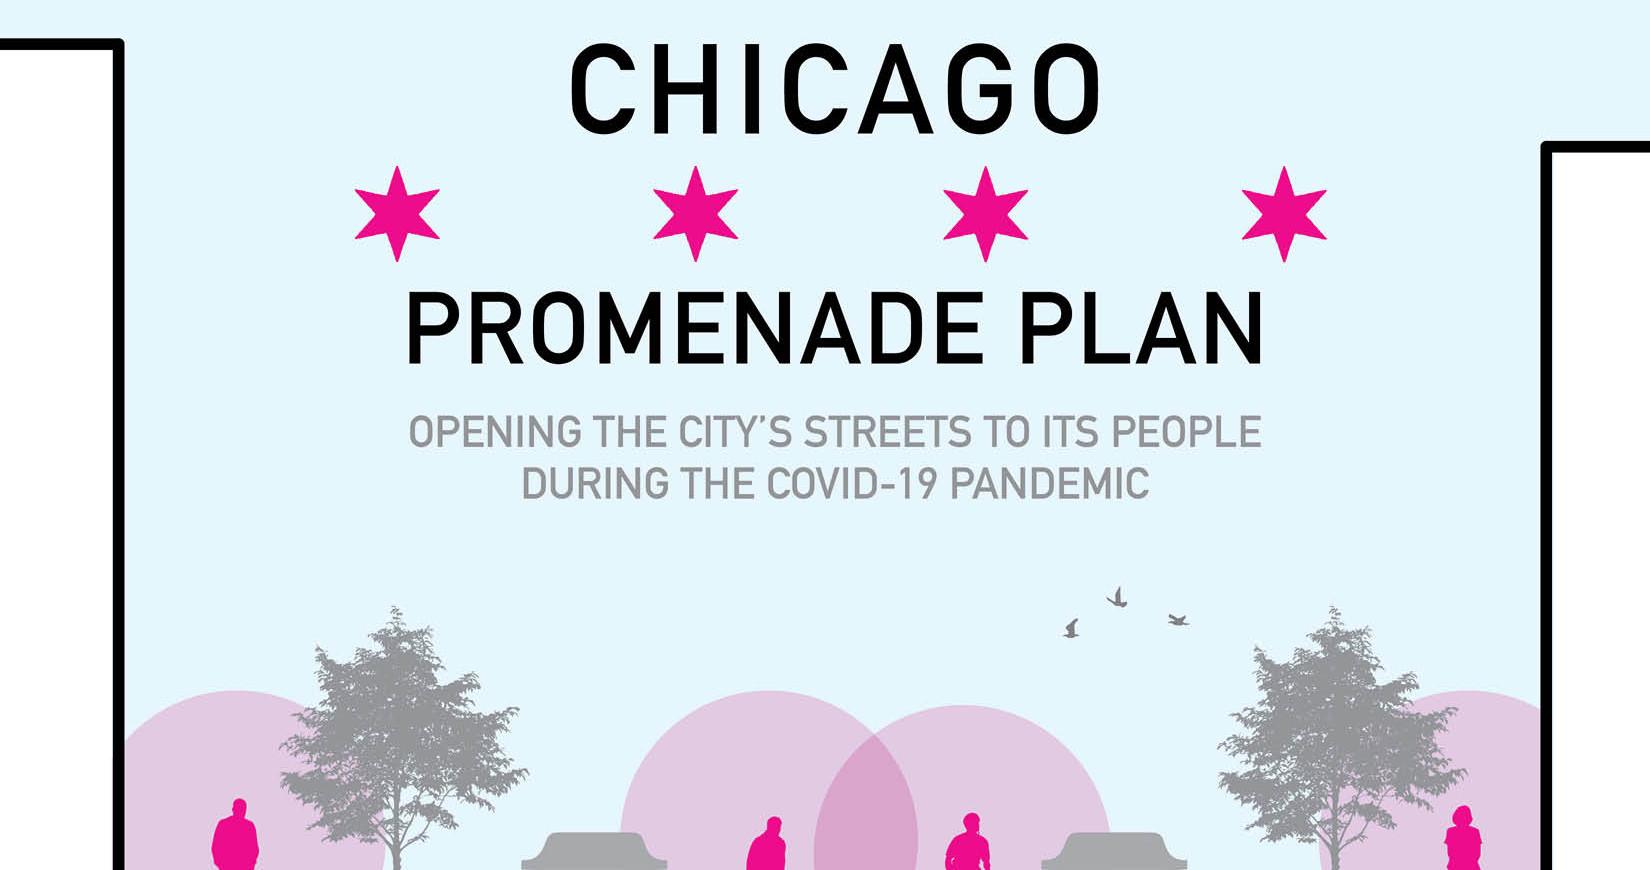 CHICAGO PROMENADE PLAN